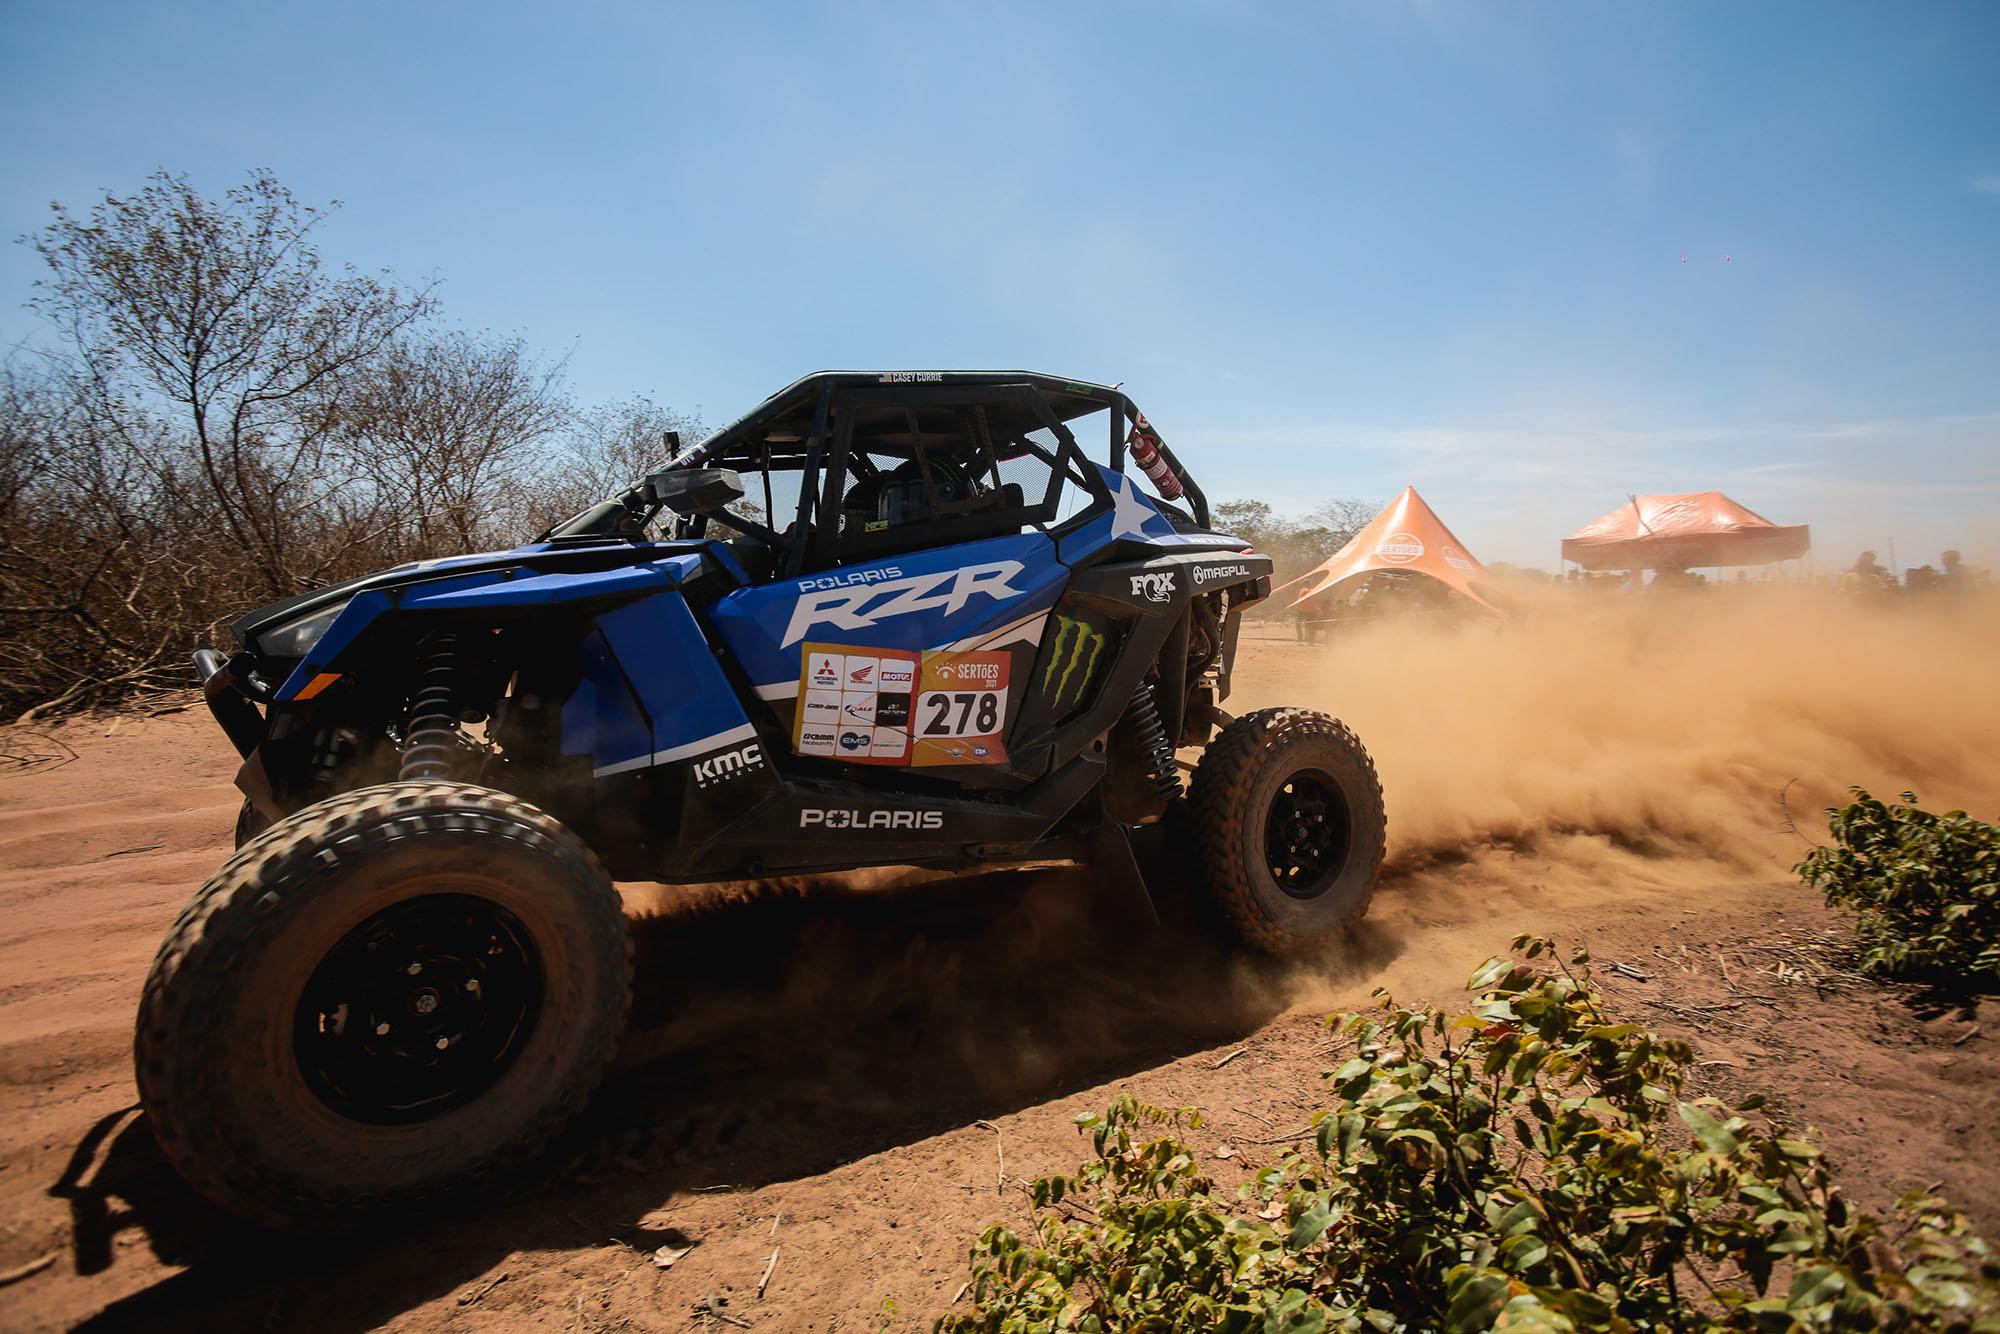 2021_Casey-Currie_Sertoes-Rally_Brazil_PolarisRZR_Stage5_004.jpg